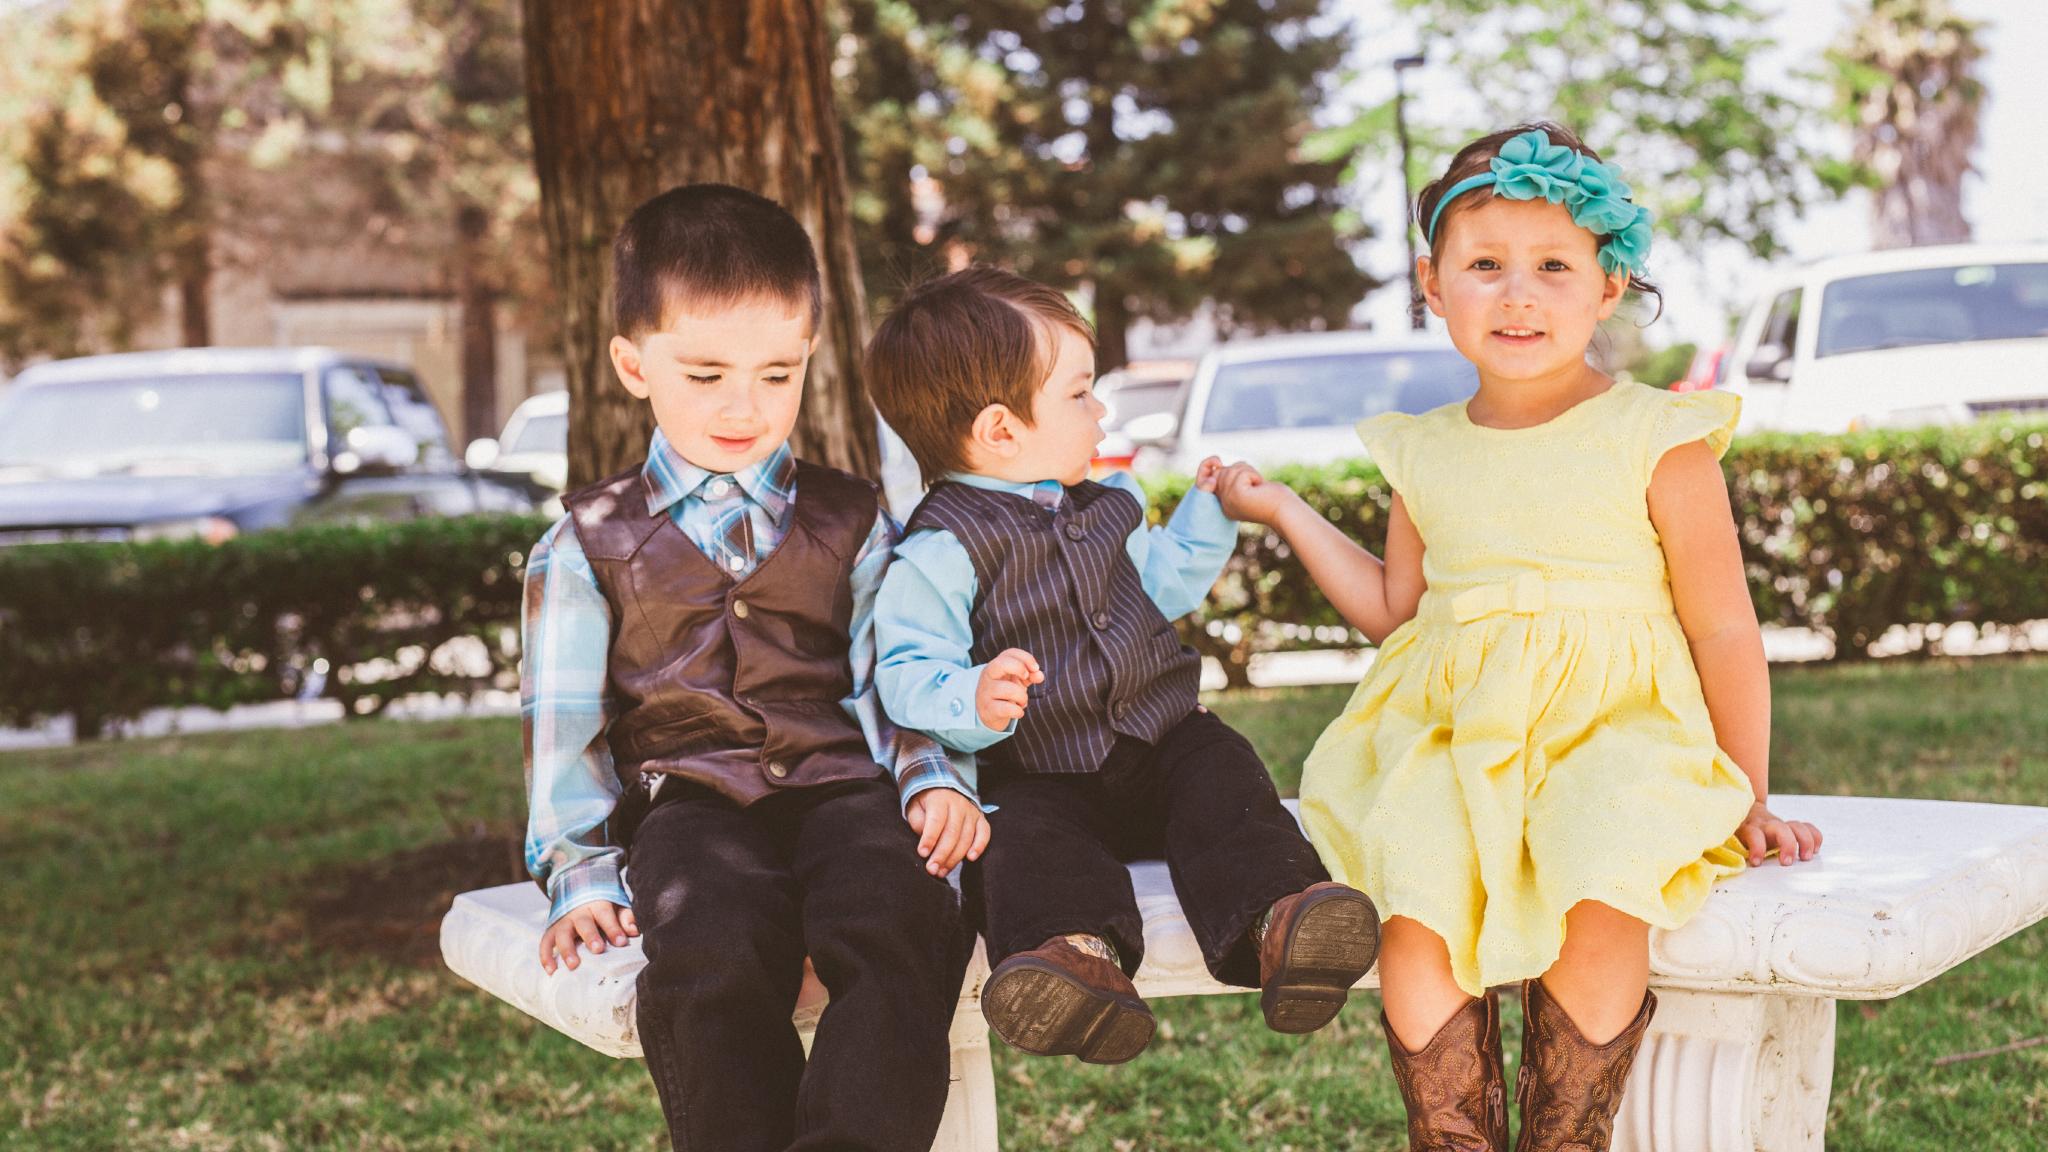 san diego wedding   photographer   children in vests and yellow dress